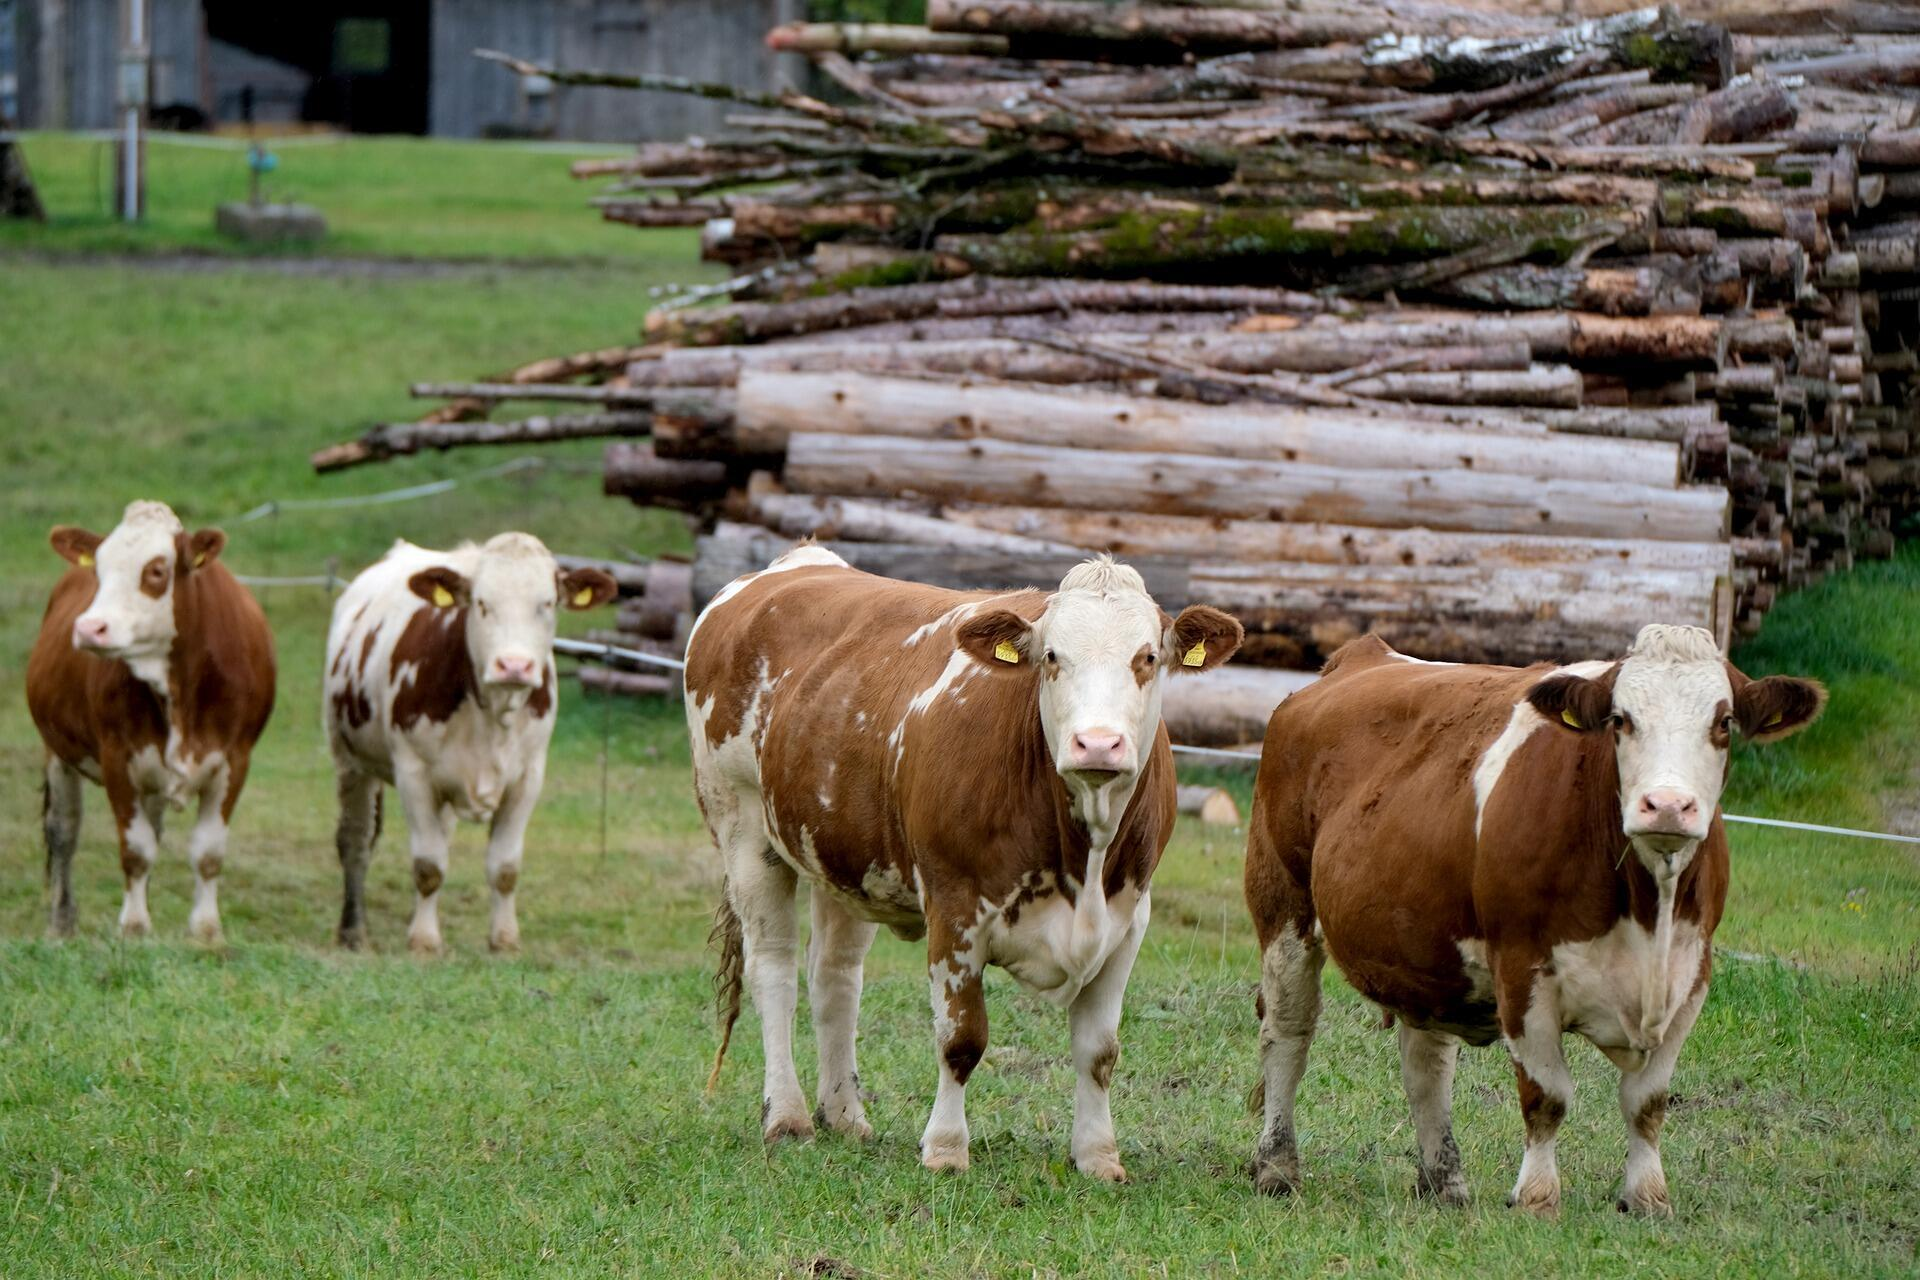 cow-5717276_1920